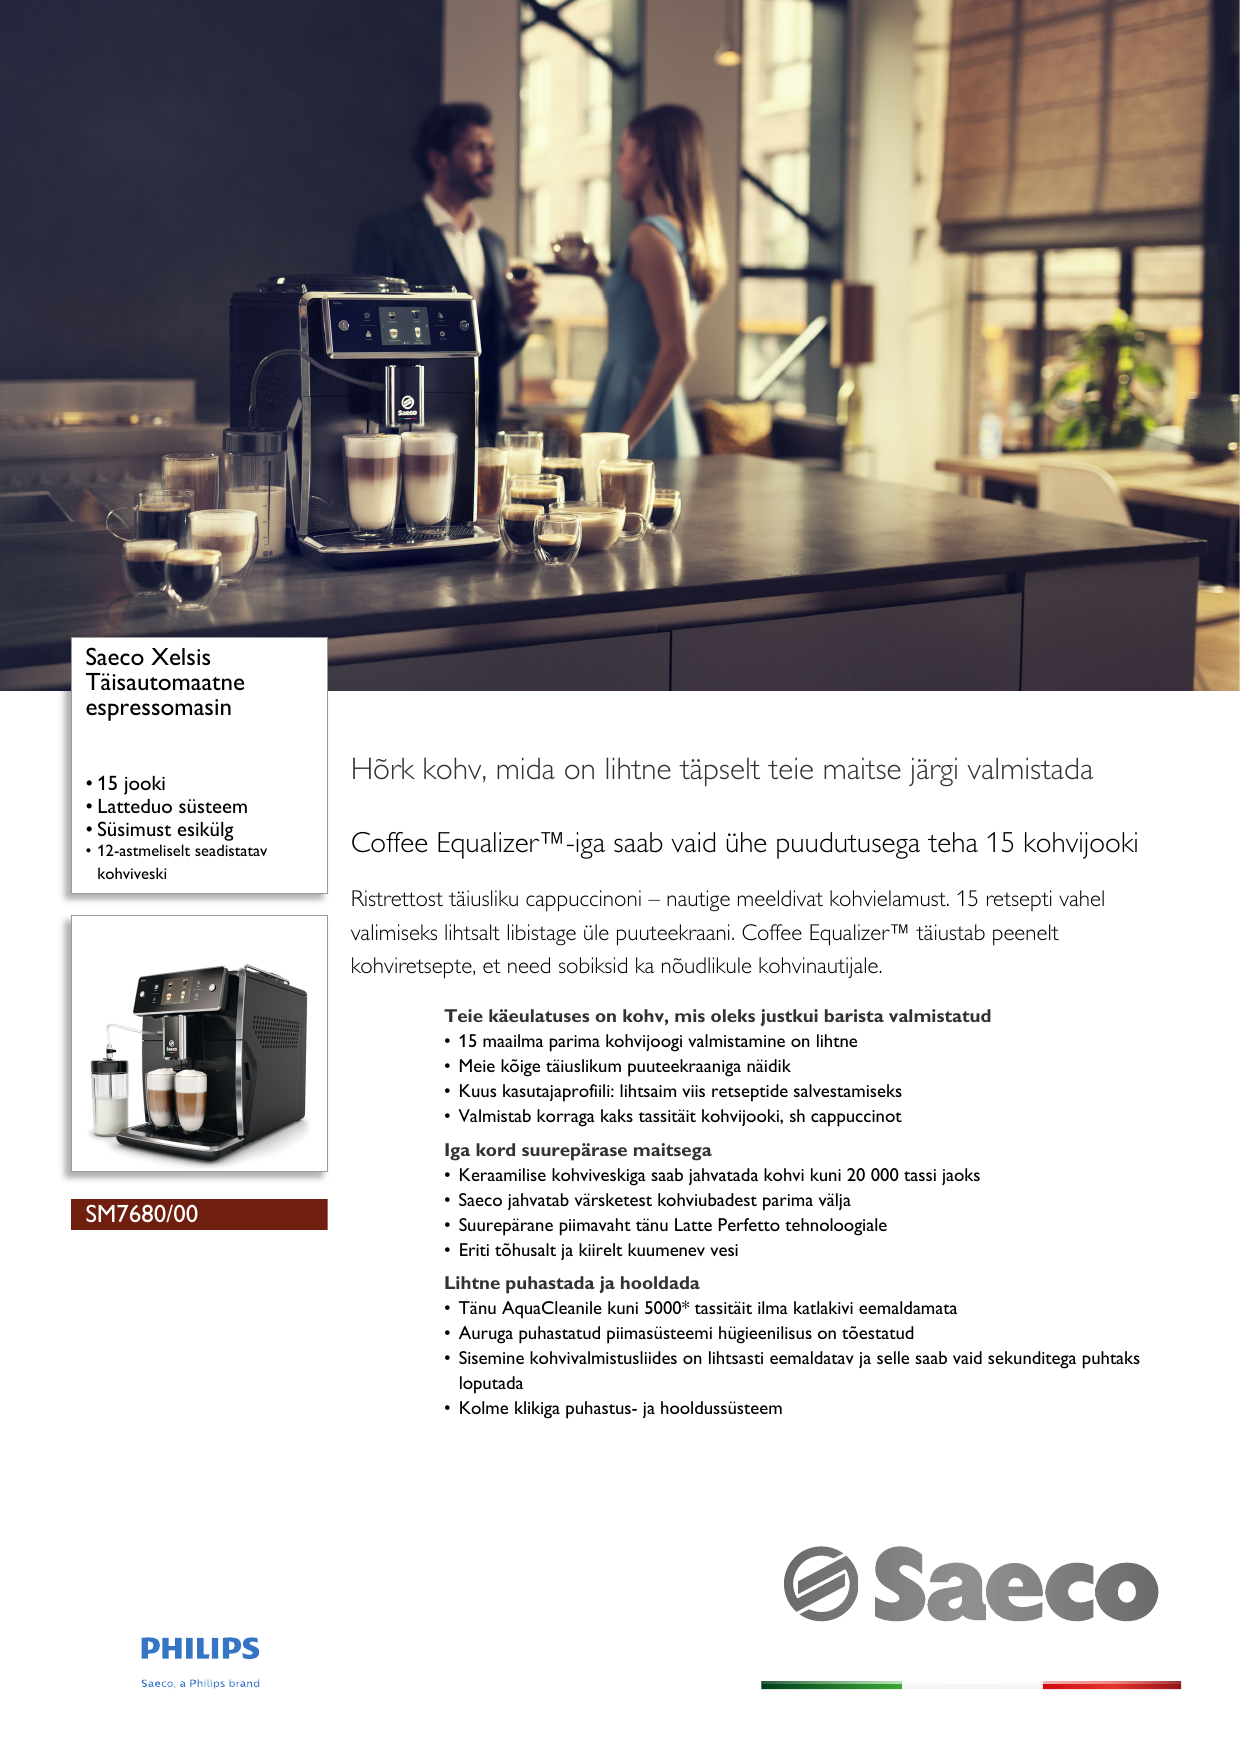 c4f42cfa92ba Philips SM7680 00 Saeco Täisautomaatne Espressomasin User Manual Voldik Sm7680  00 Pss Estee